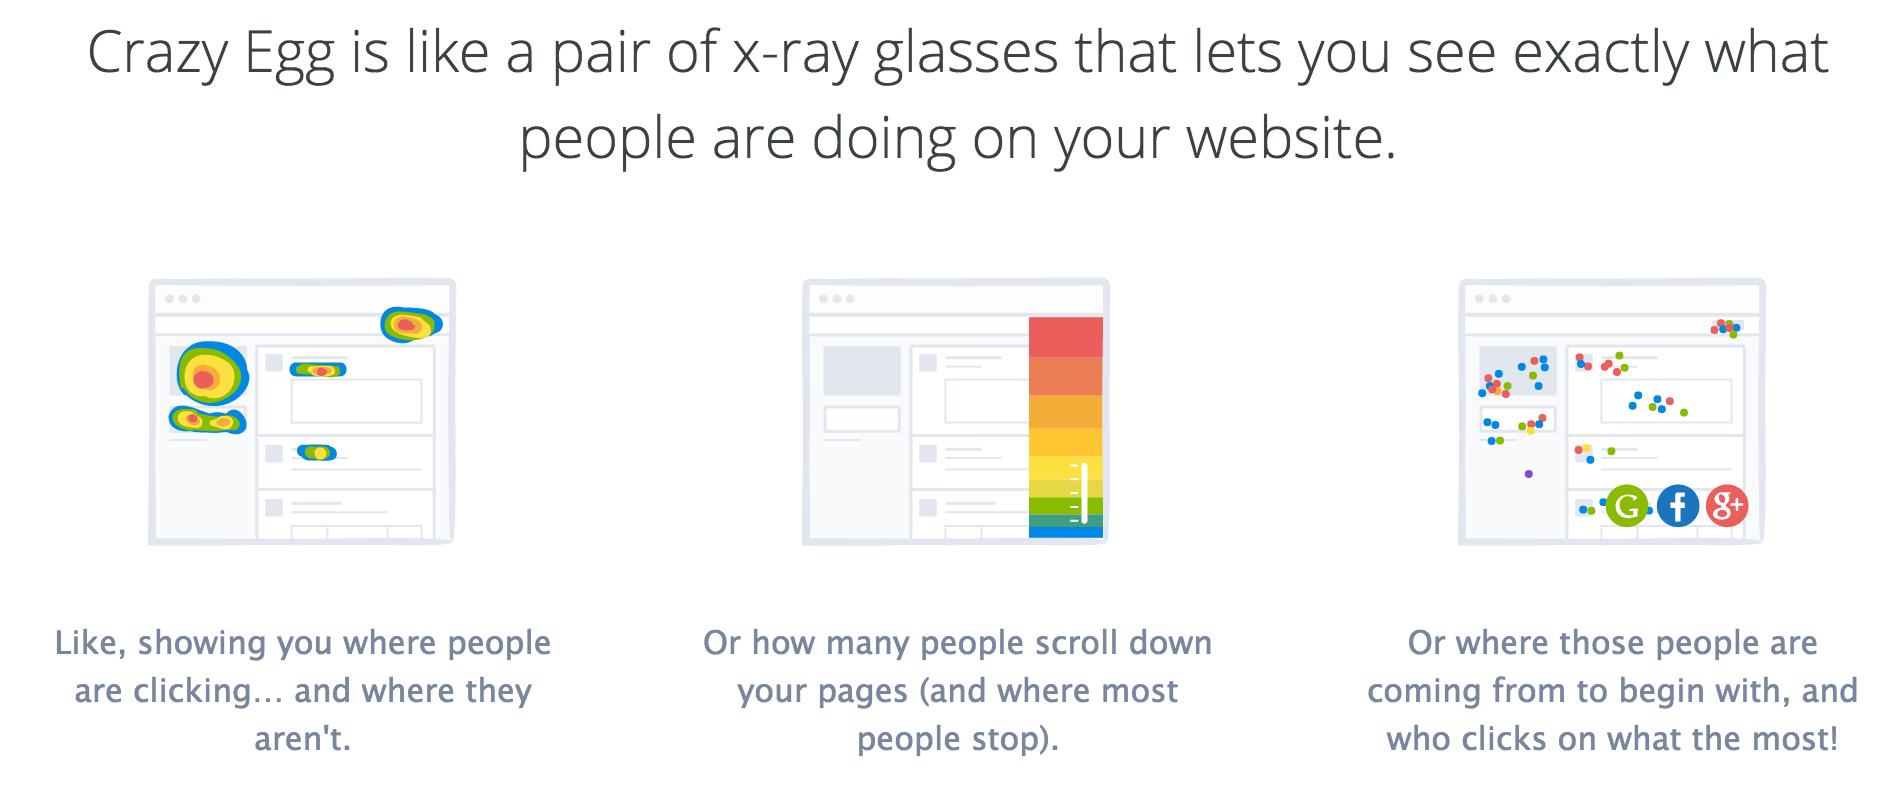 crazyegg-homepage-screenshot